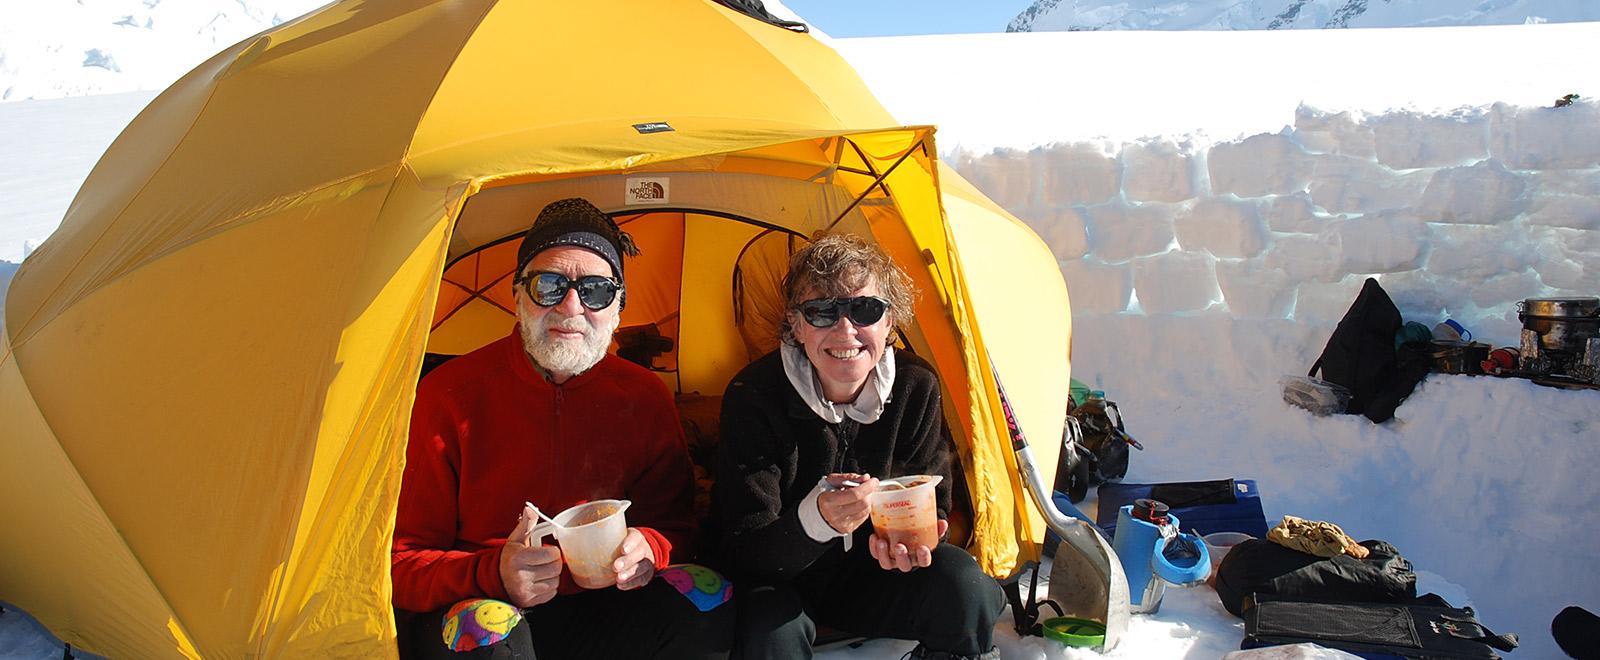 camping ski trip